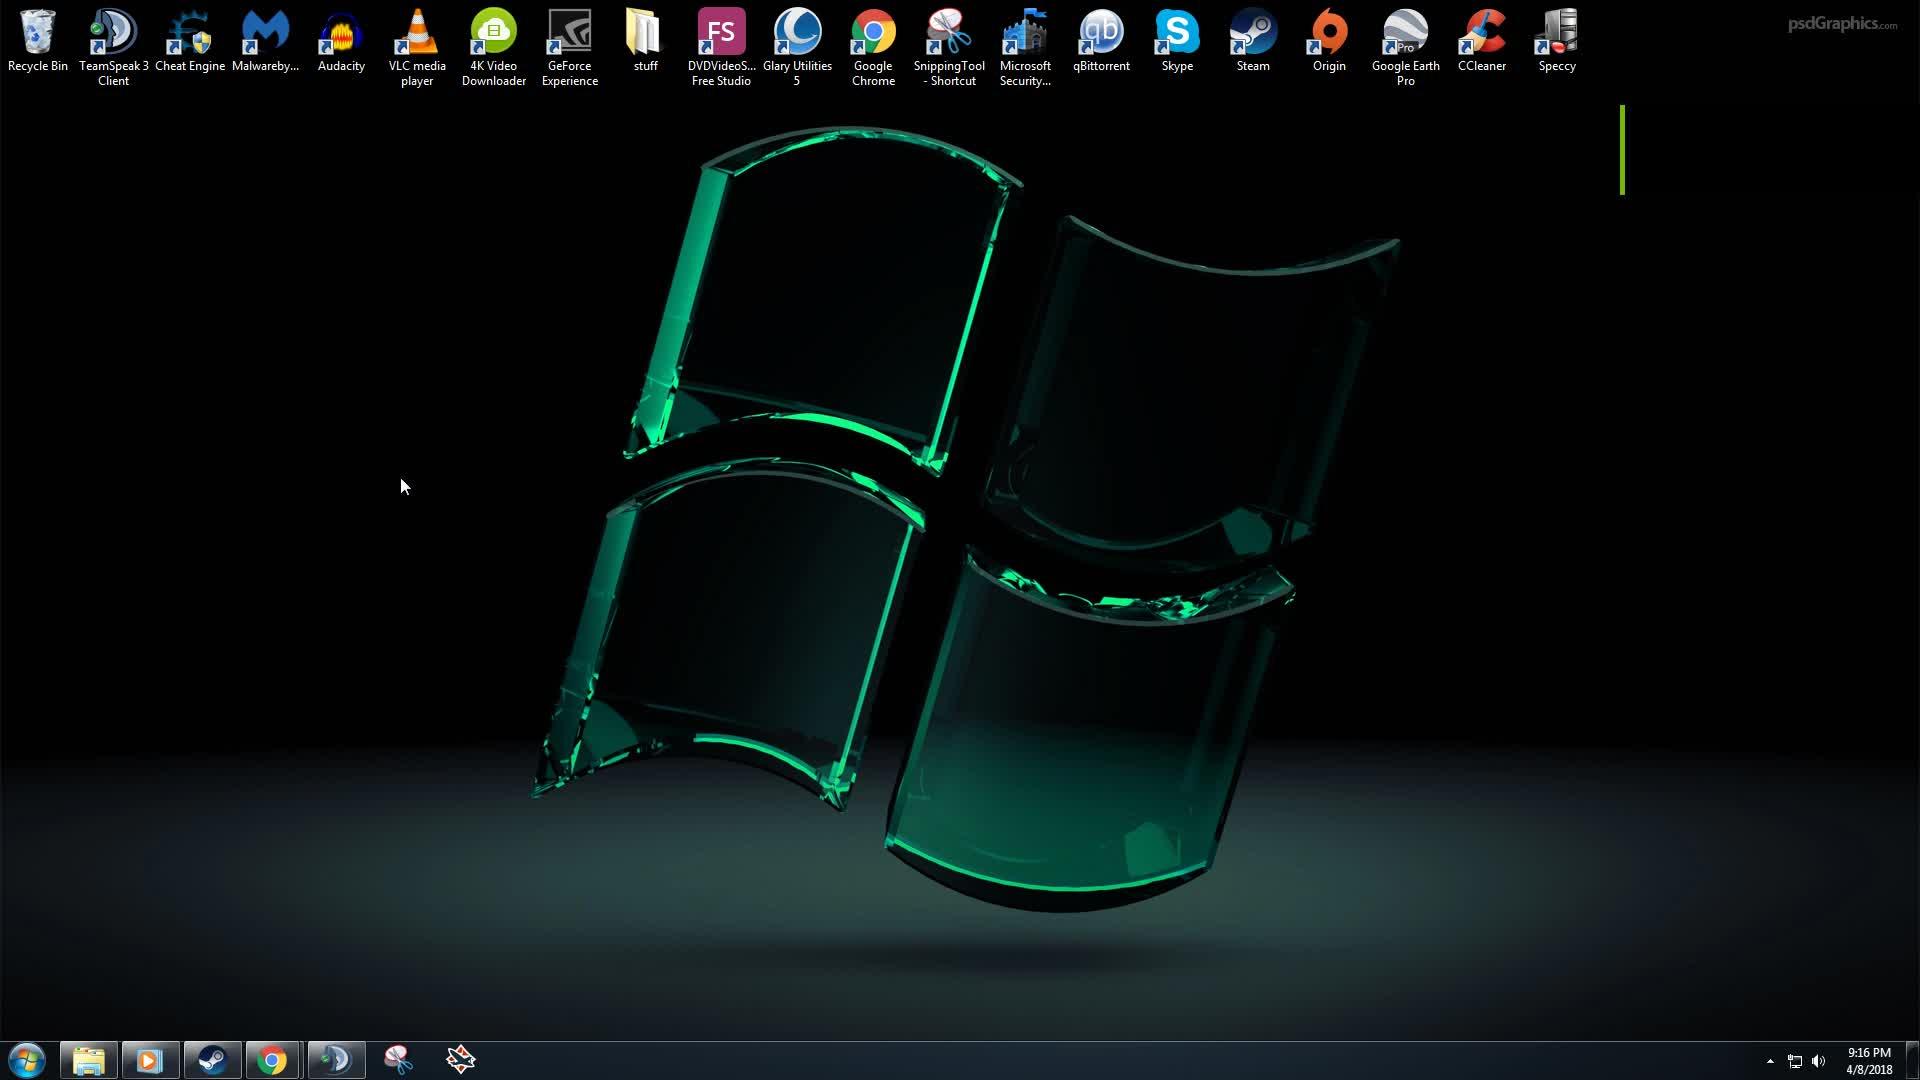 Desktop 2018 04 08 21 16 55 55